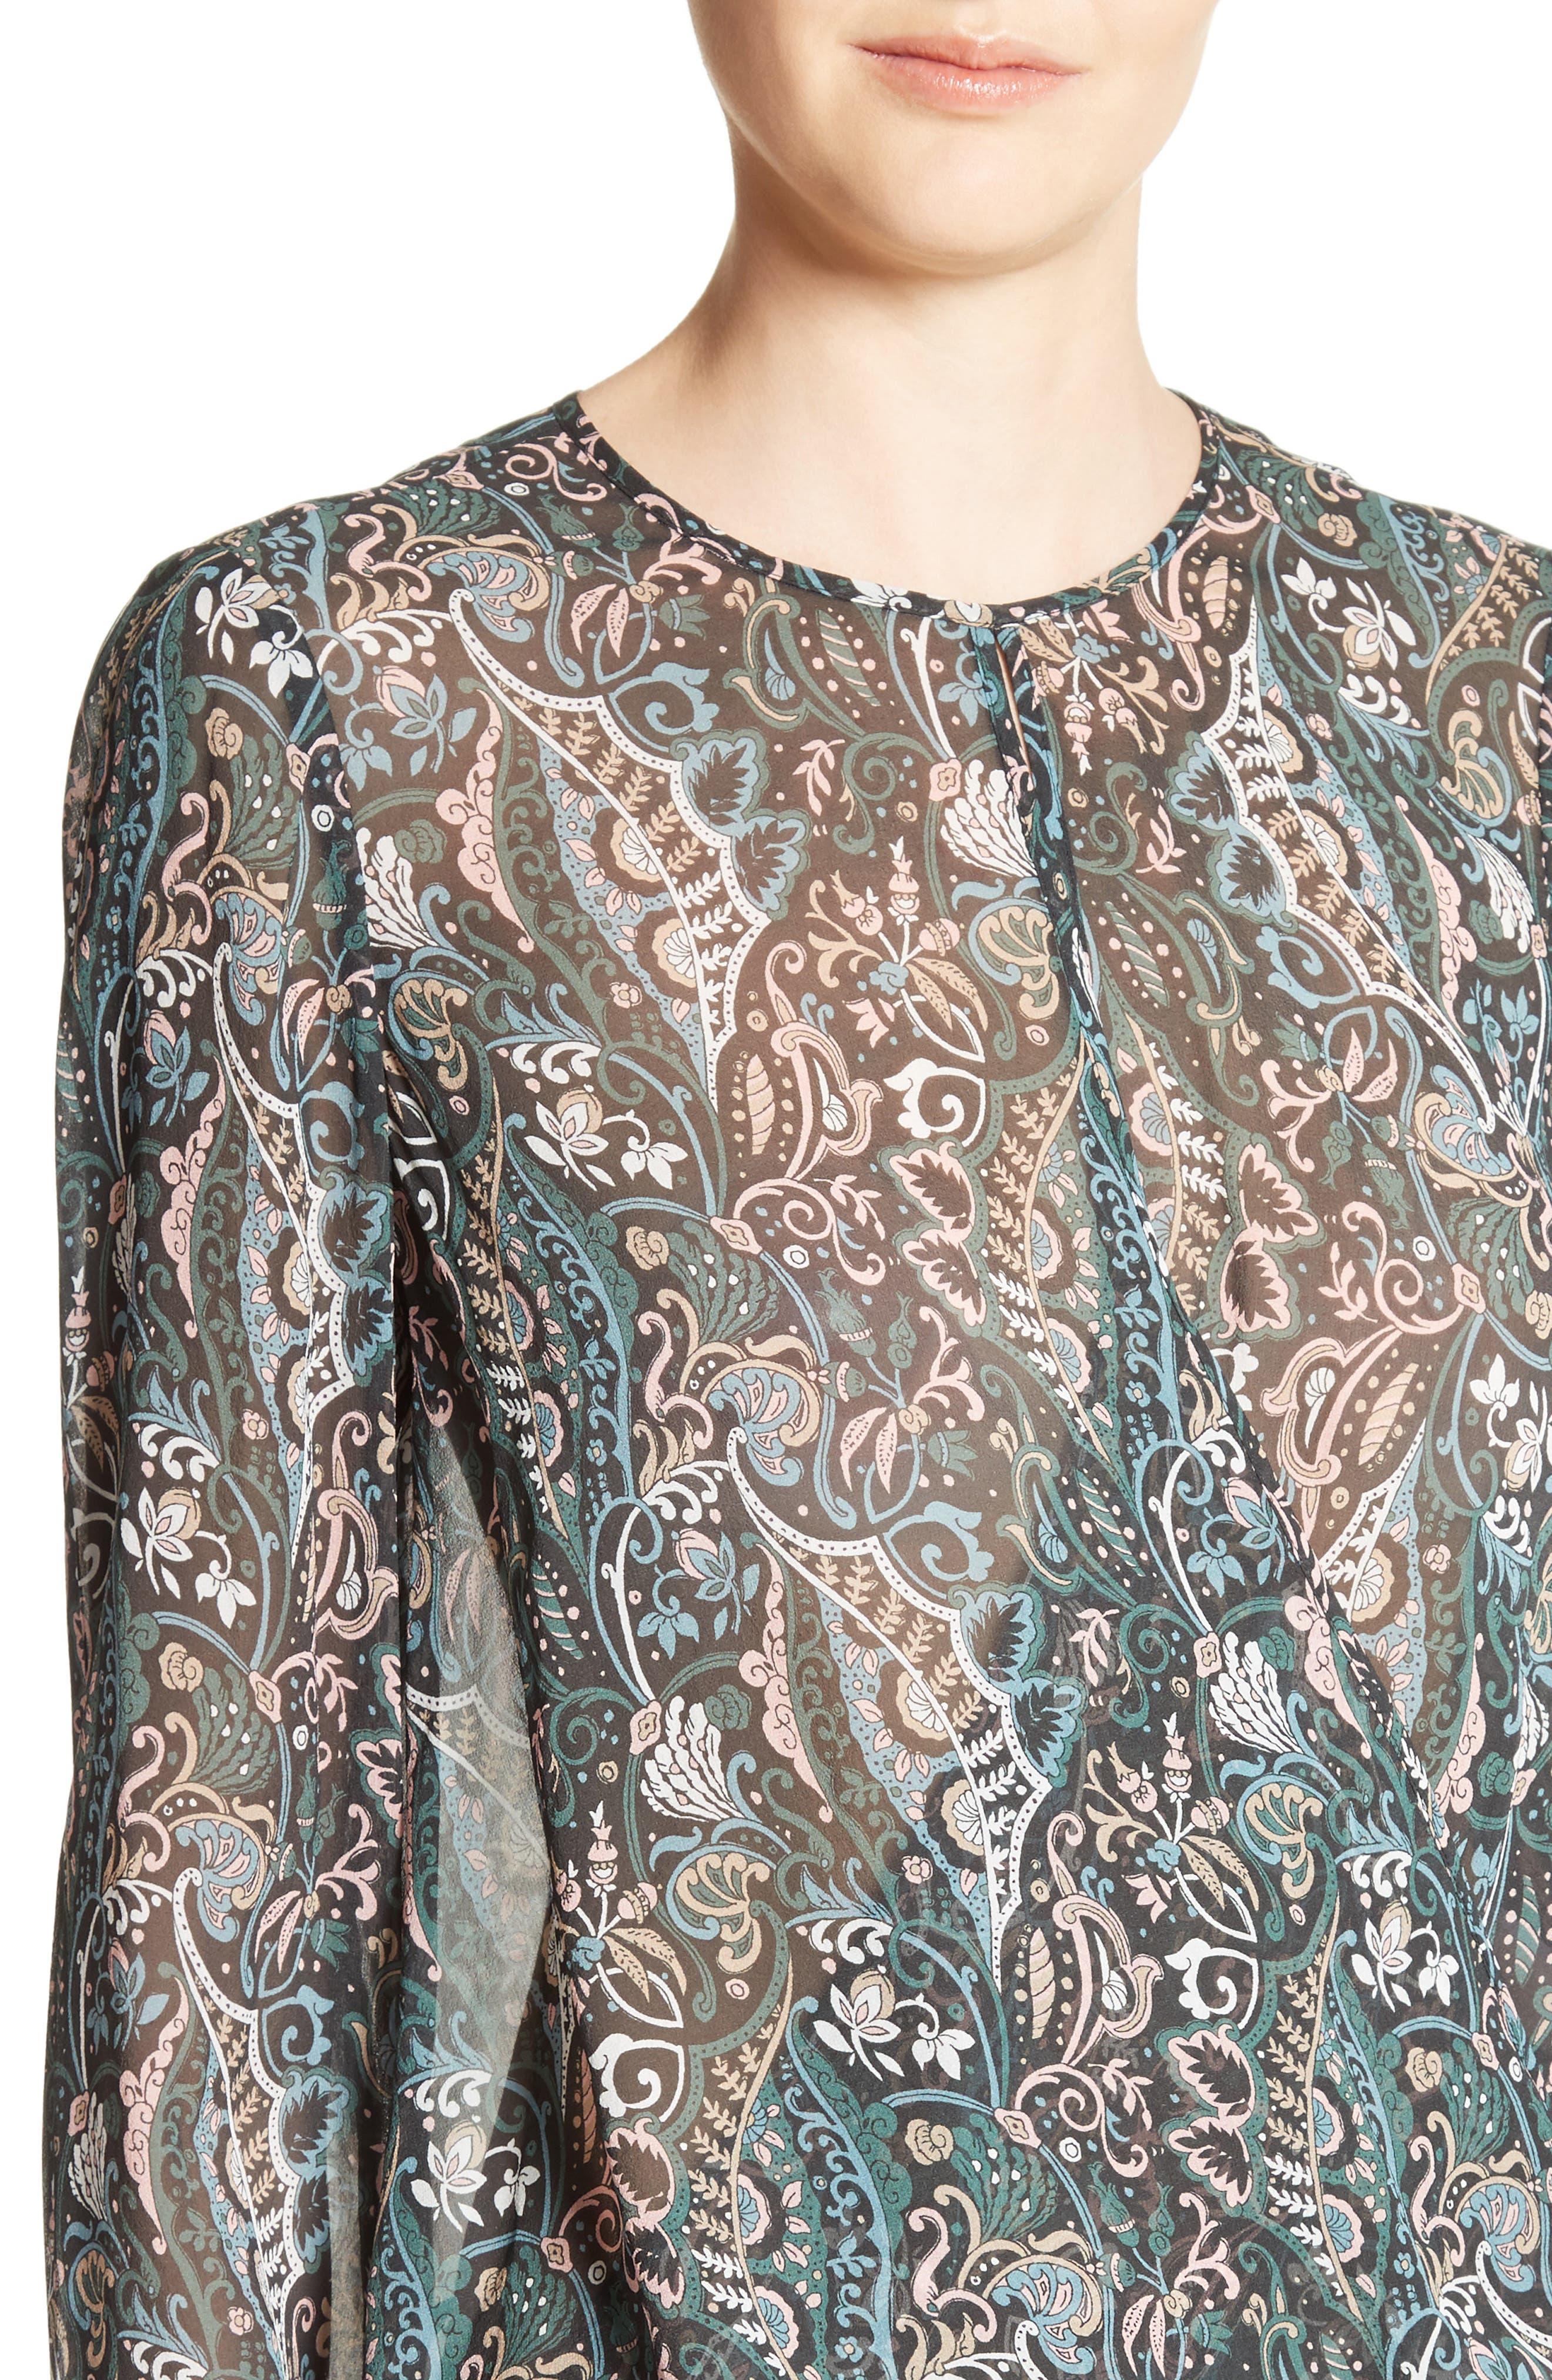 Gayle Paisley Print Silk Blouse,                             Alternate thumbnail 4, color,                             Nude/ Blue/ Green Multi